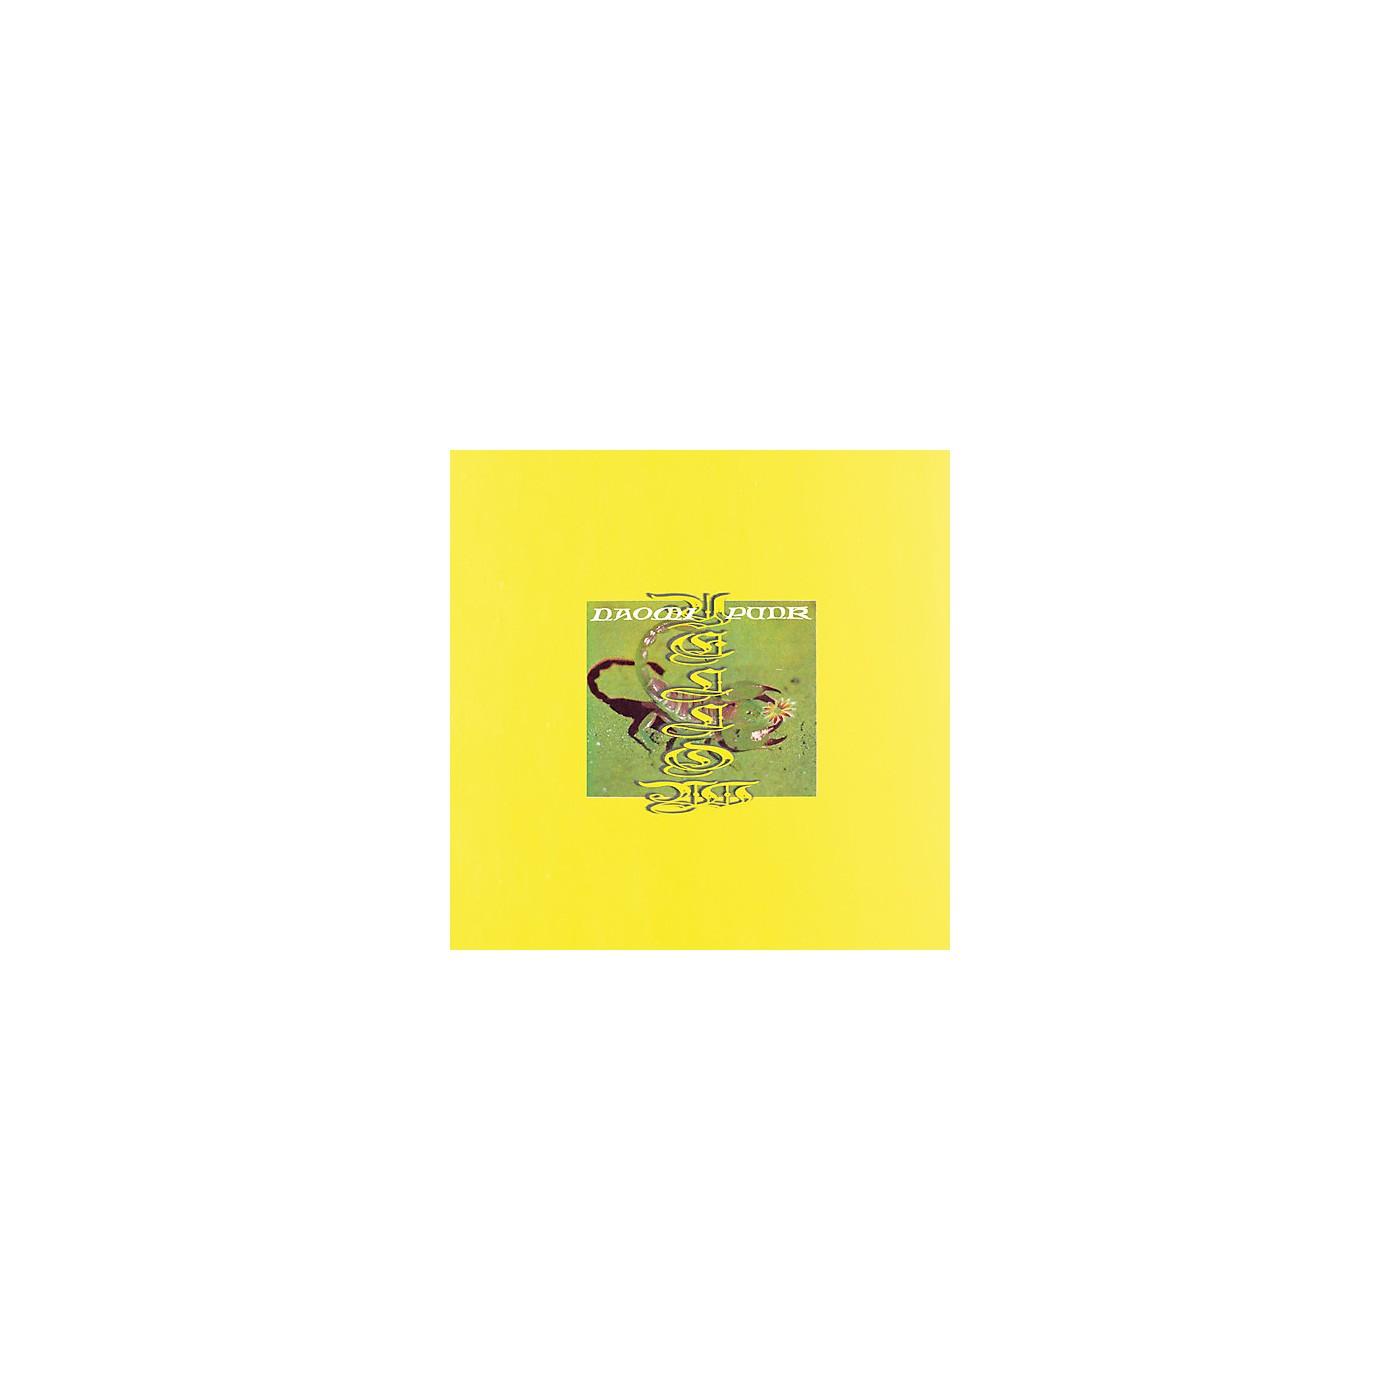 Alliance Naomi Punk - Yellow thumbnail